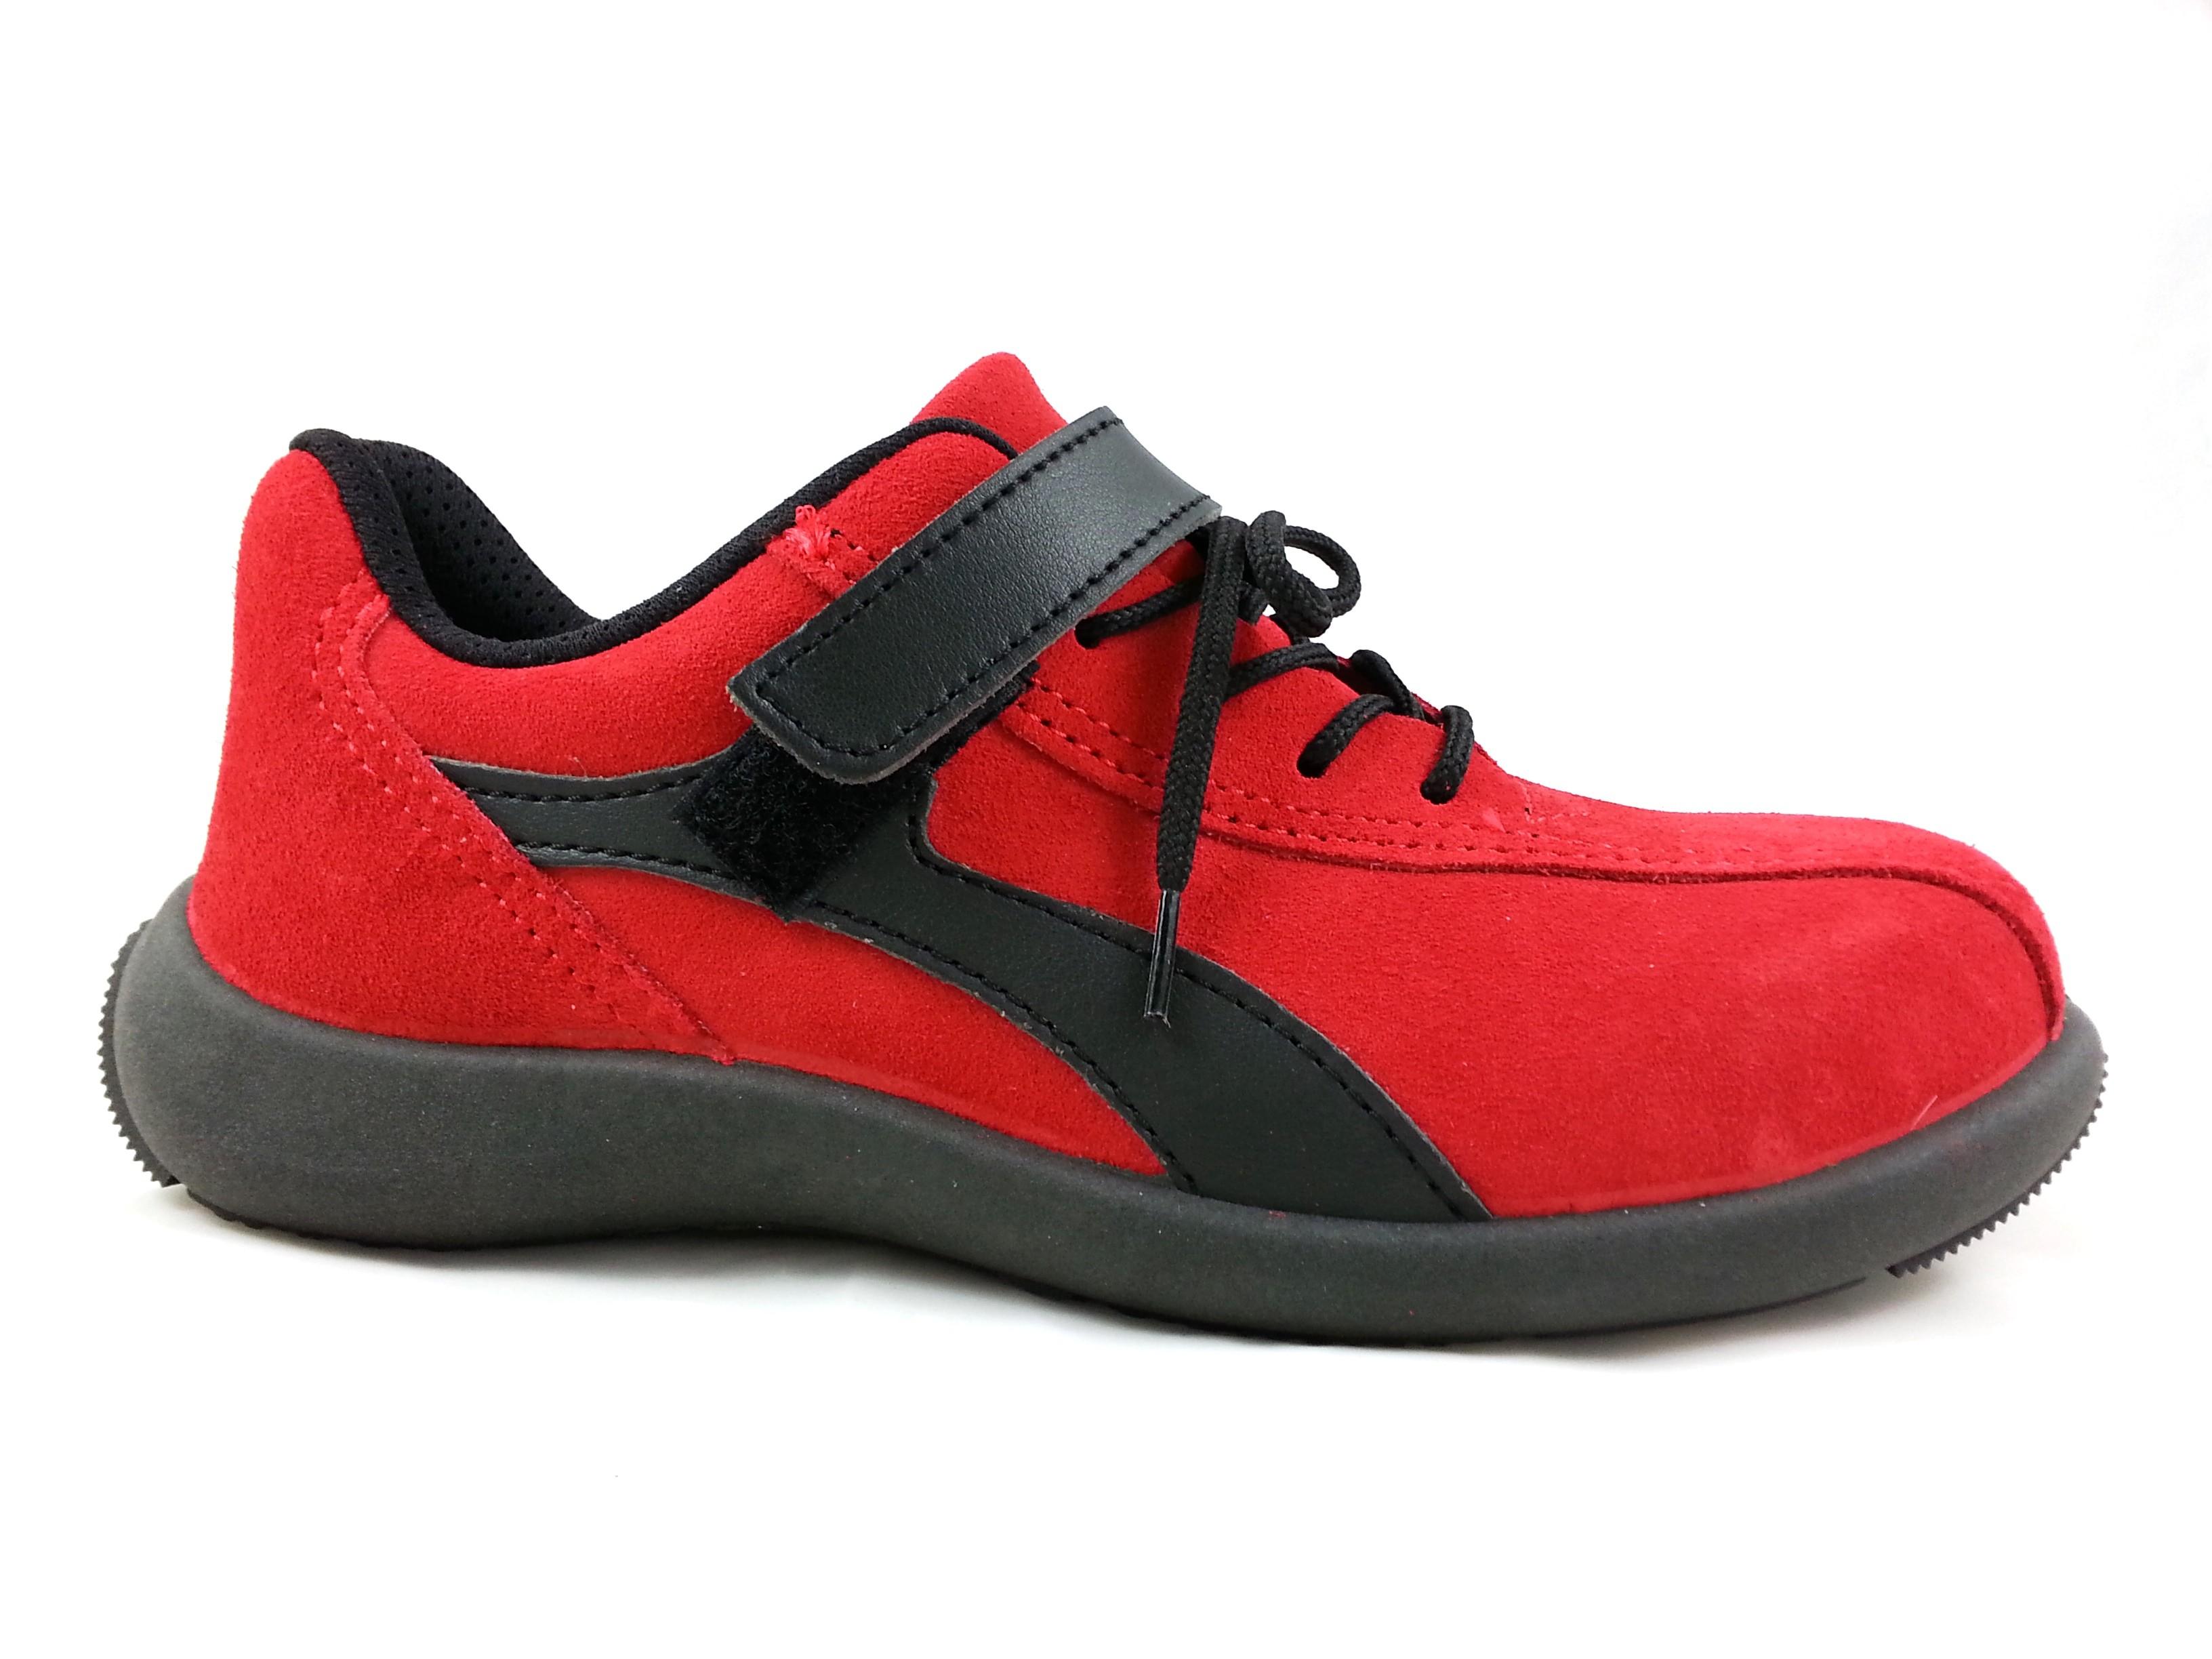 Chaussure de securite femme...